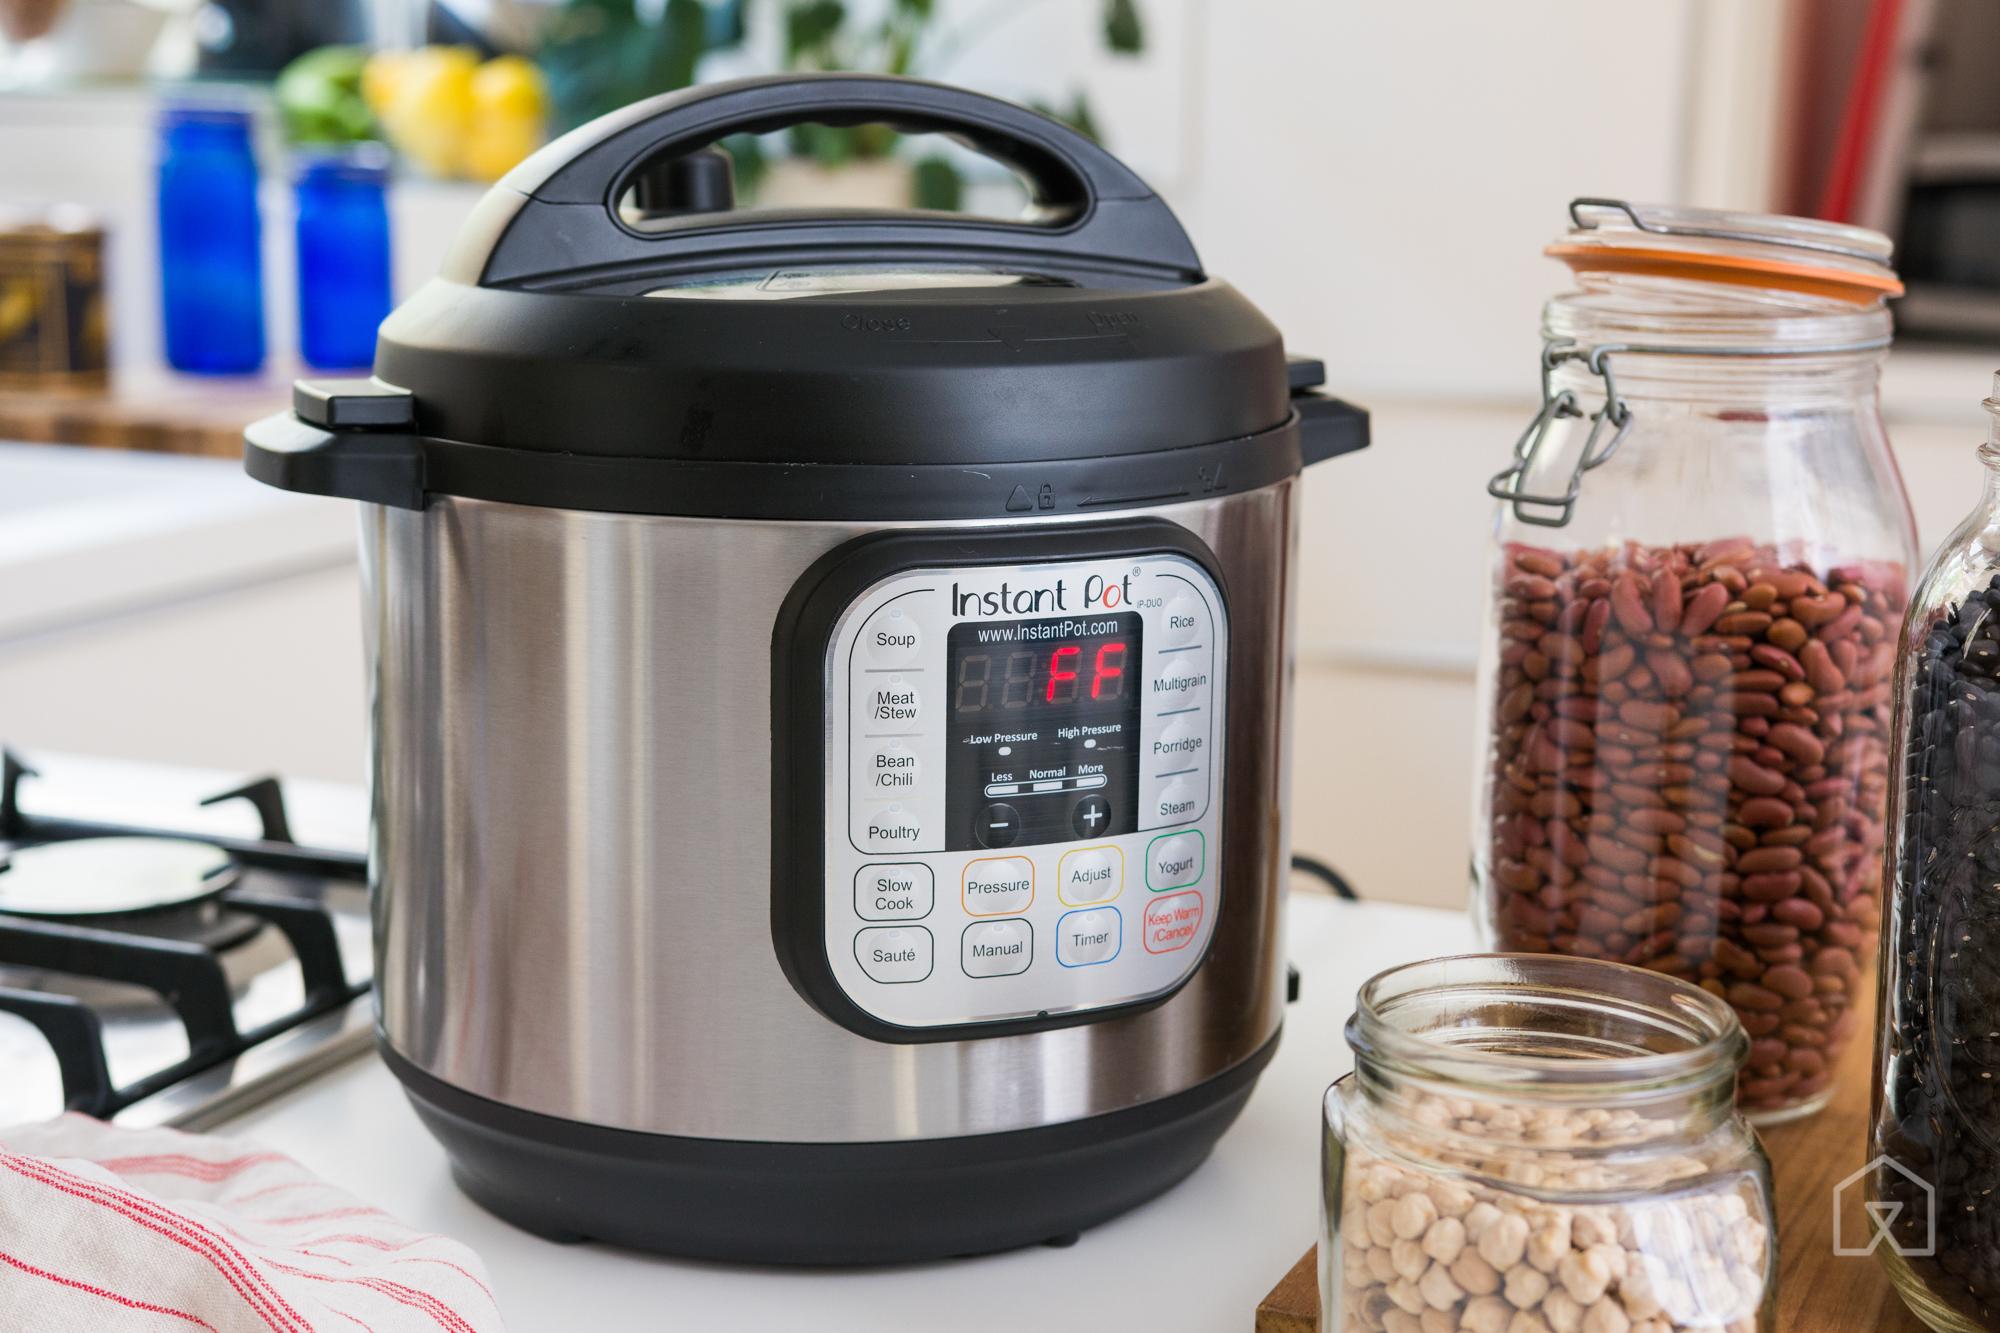 kyowa rice cooker wiring diagram dimarzio dual humbucker the best pressure